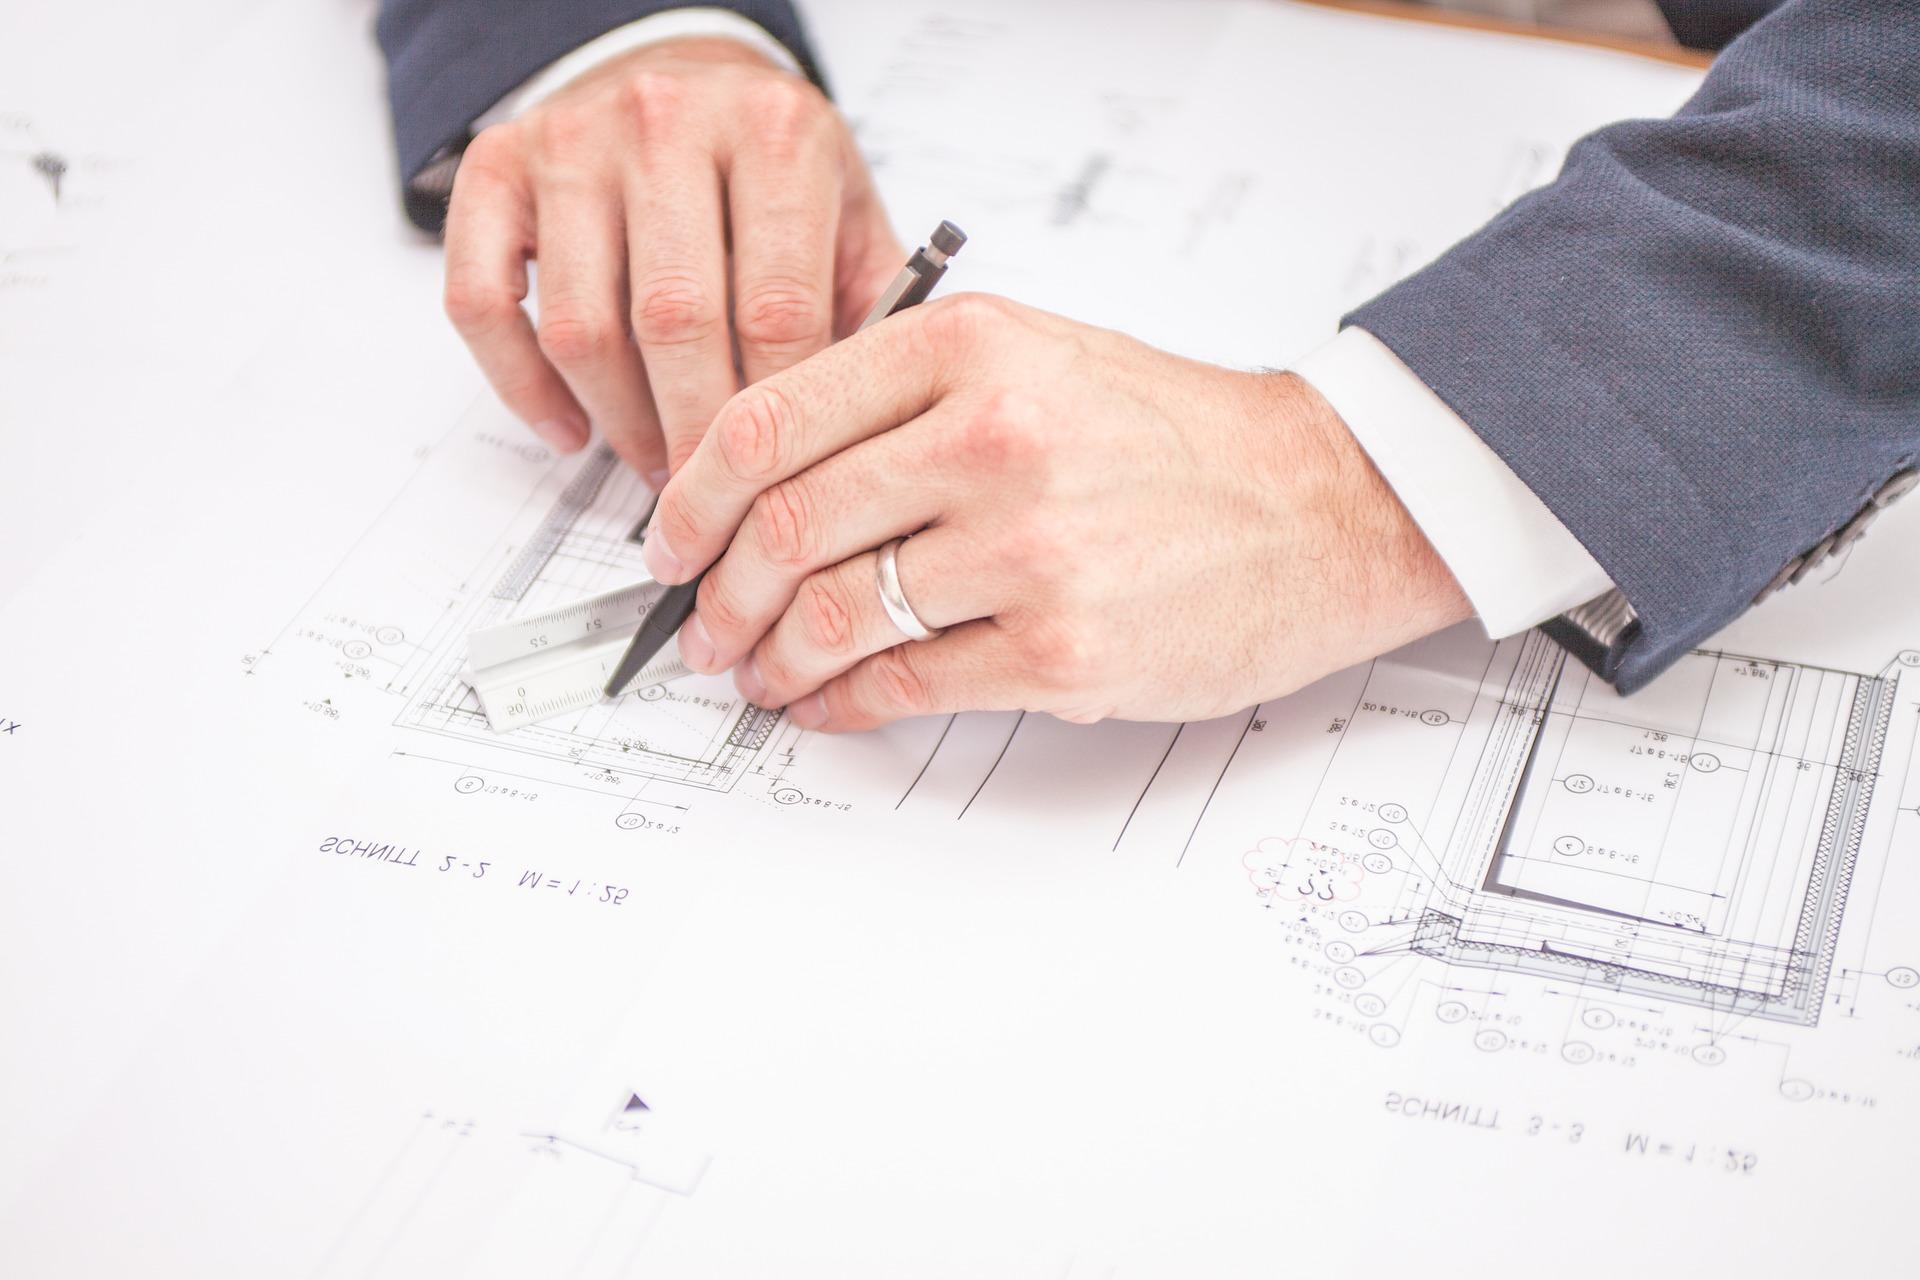 Architect Changing Plans